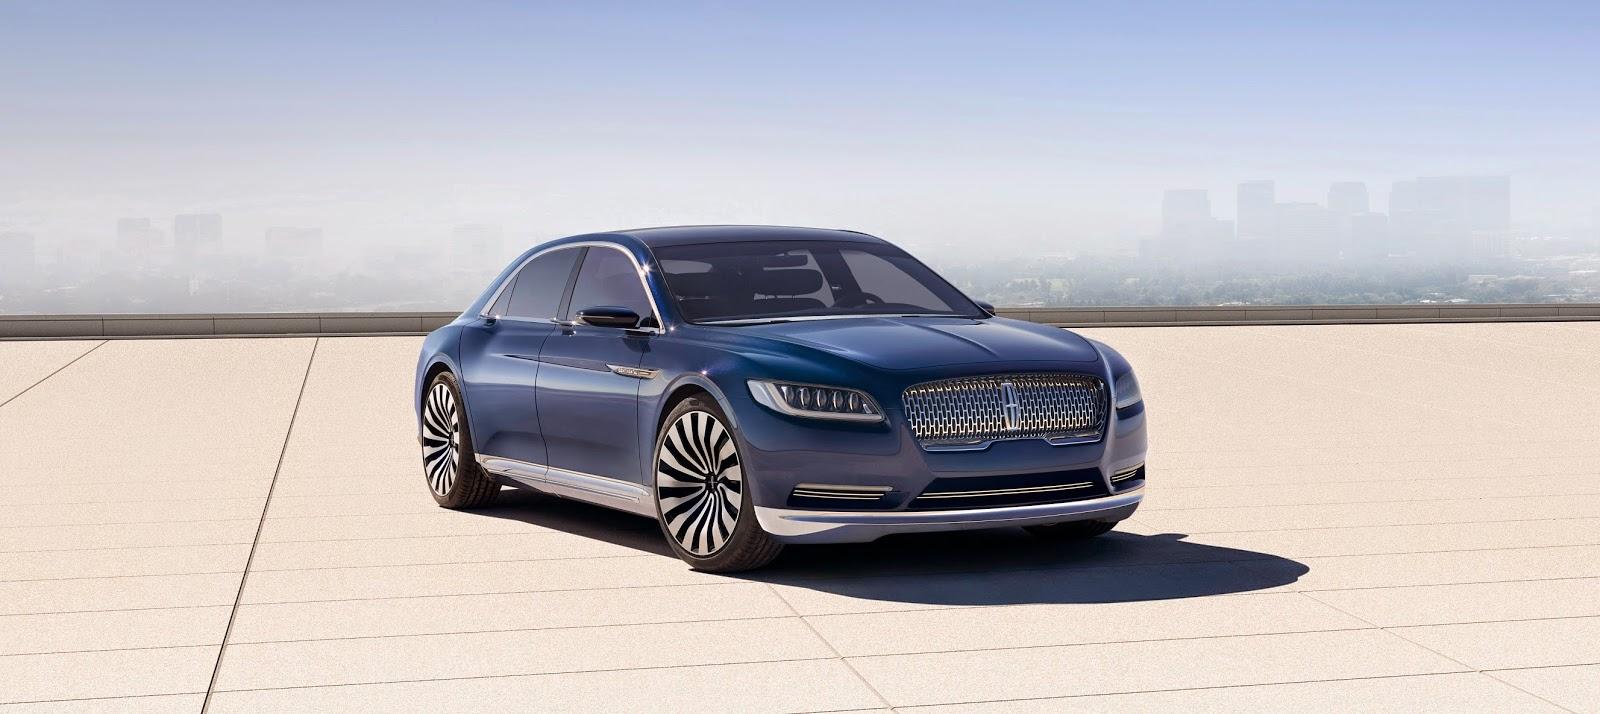 Autos Américaines Blog: New York 2015, Lincoln Continental Concept